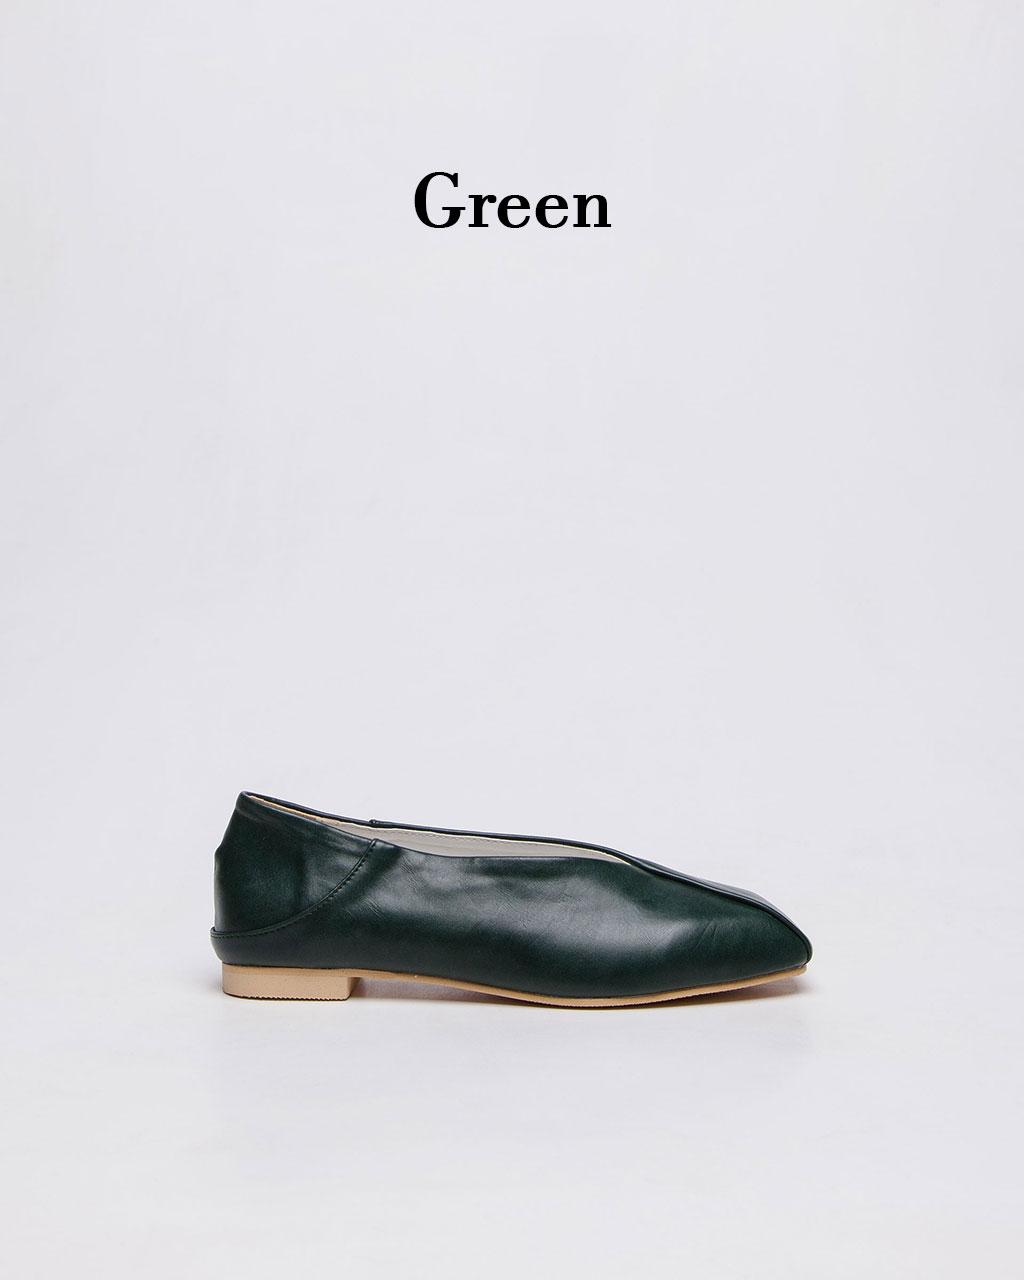 Tagtraume Leaf-04 - Green(그린)